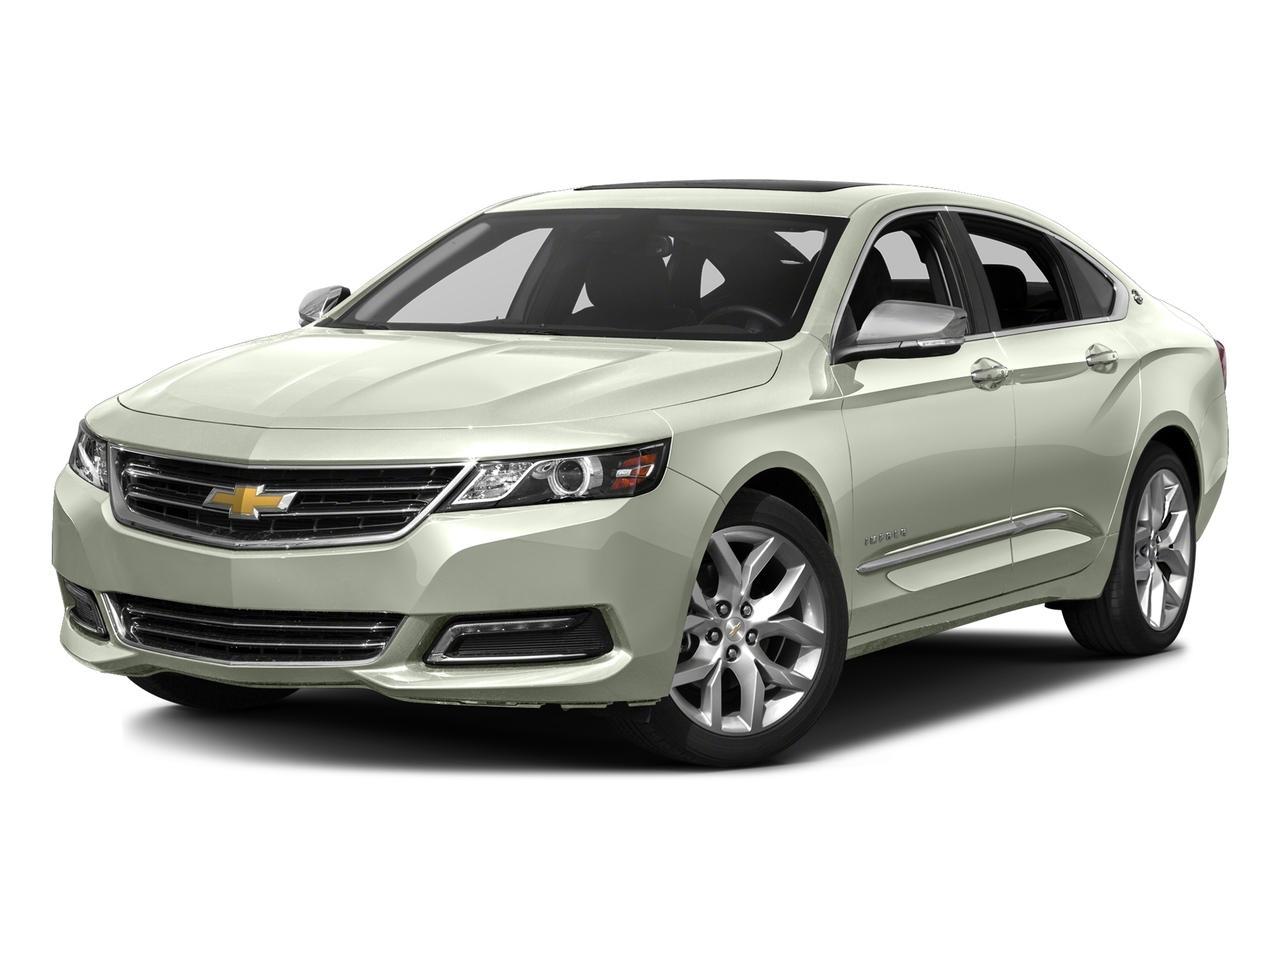 2017 Chevrolet Impala Vehicle Photo in Kernersville, NC 27284